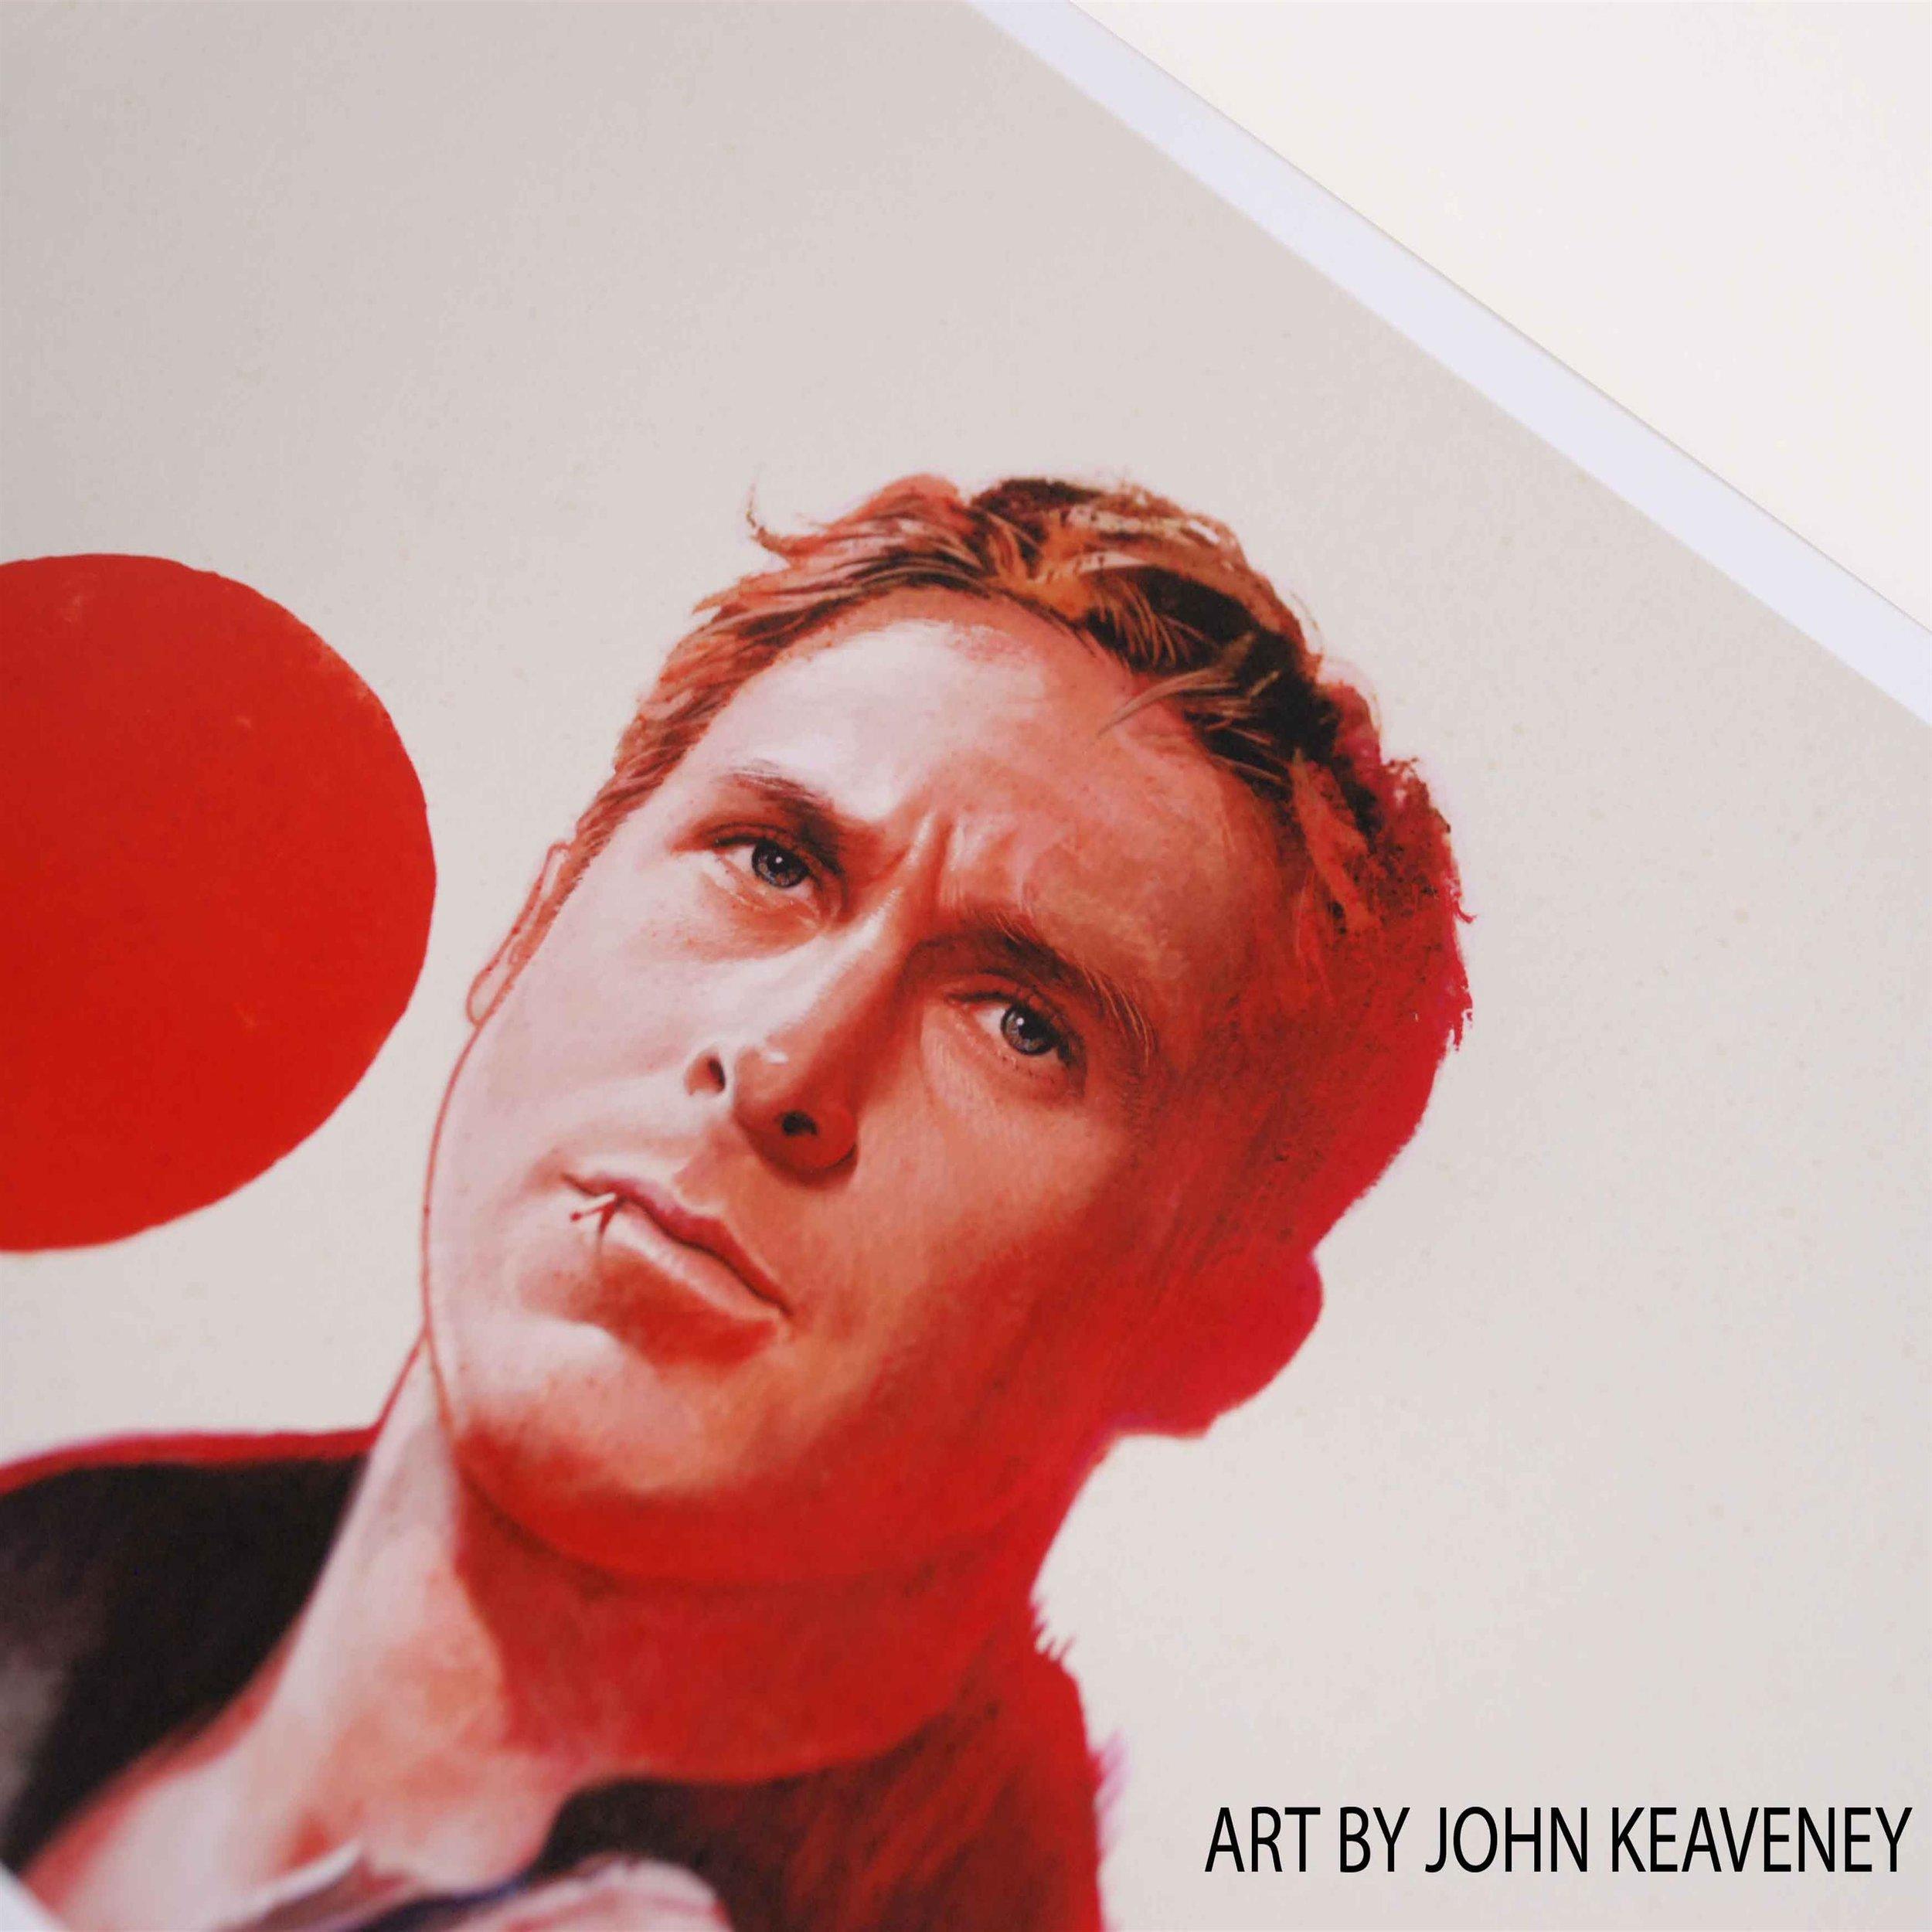 Drive Poster Teaser #Art By John Keaveney 2.jpg